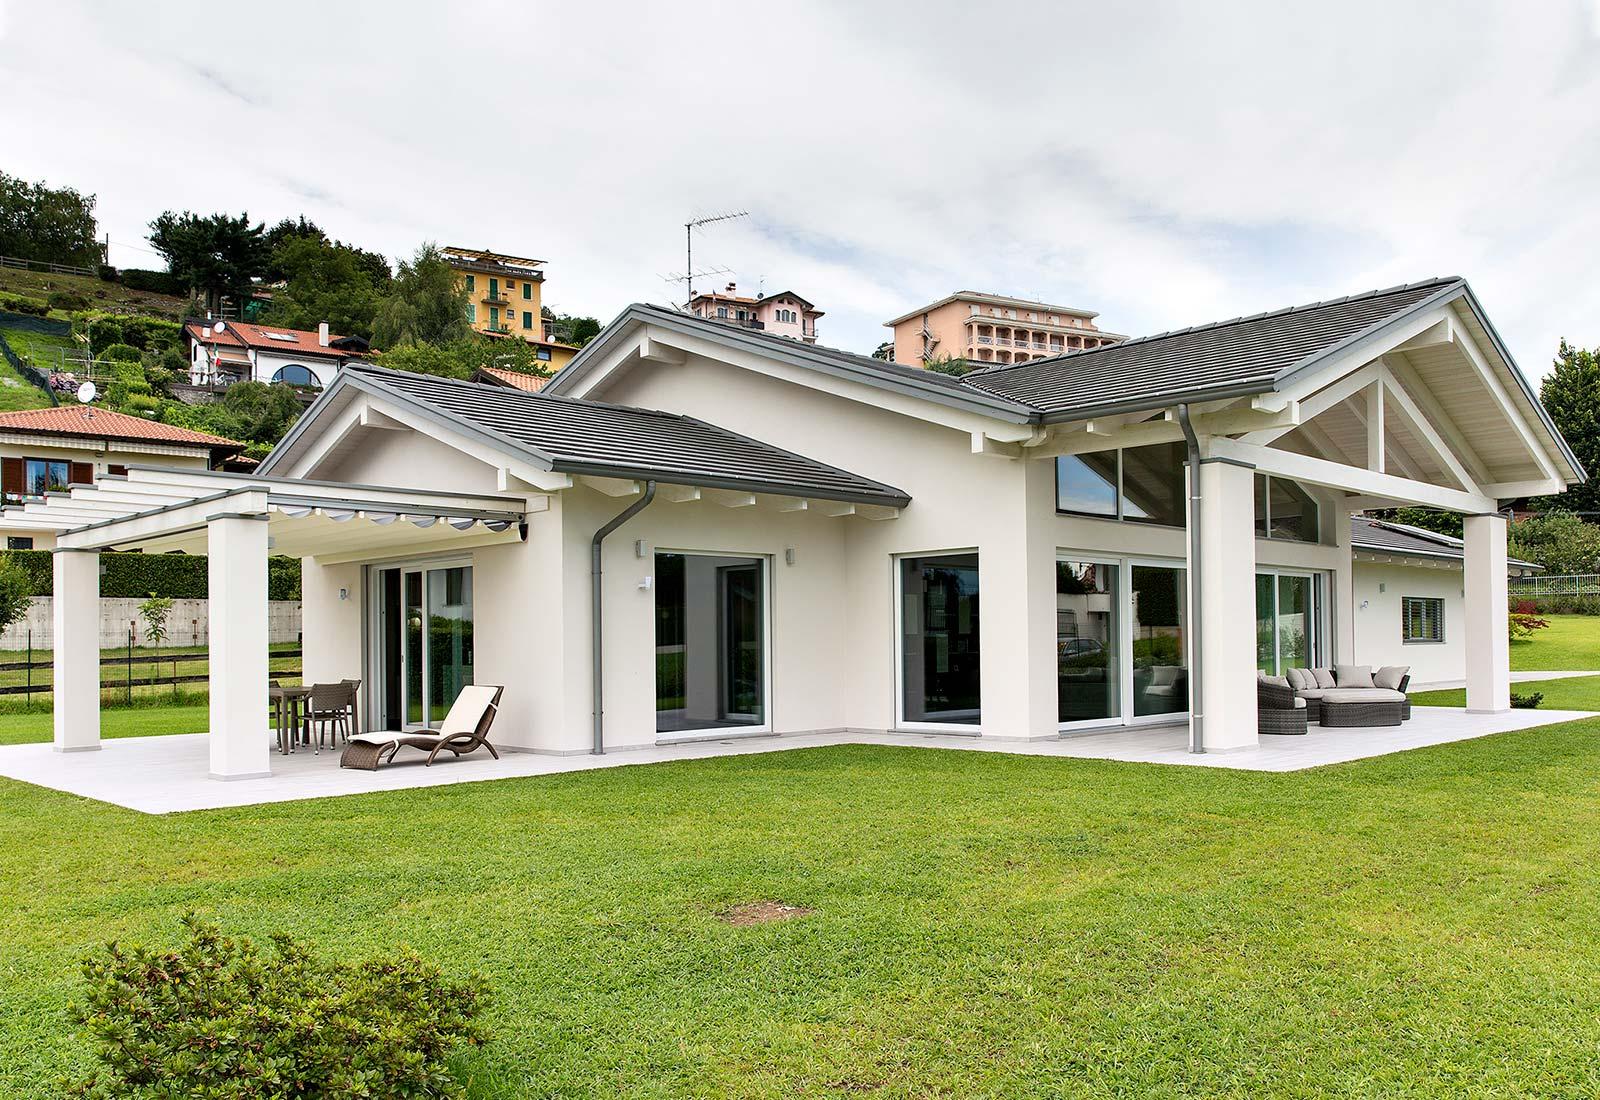 Casa-in-legno-Nebbiuno-Novara-Kager-Italia-01